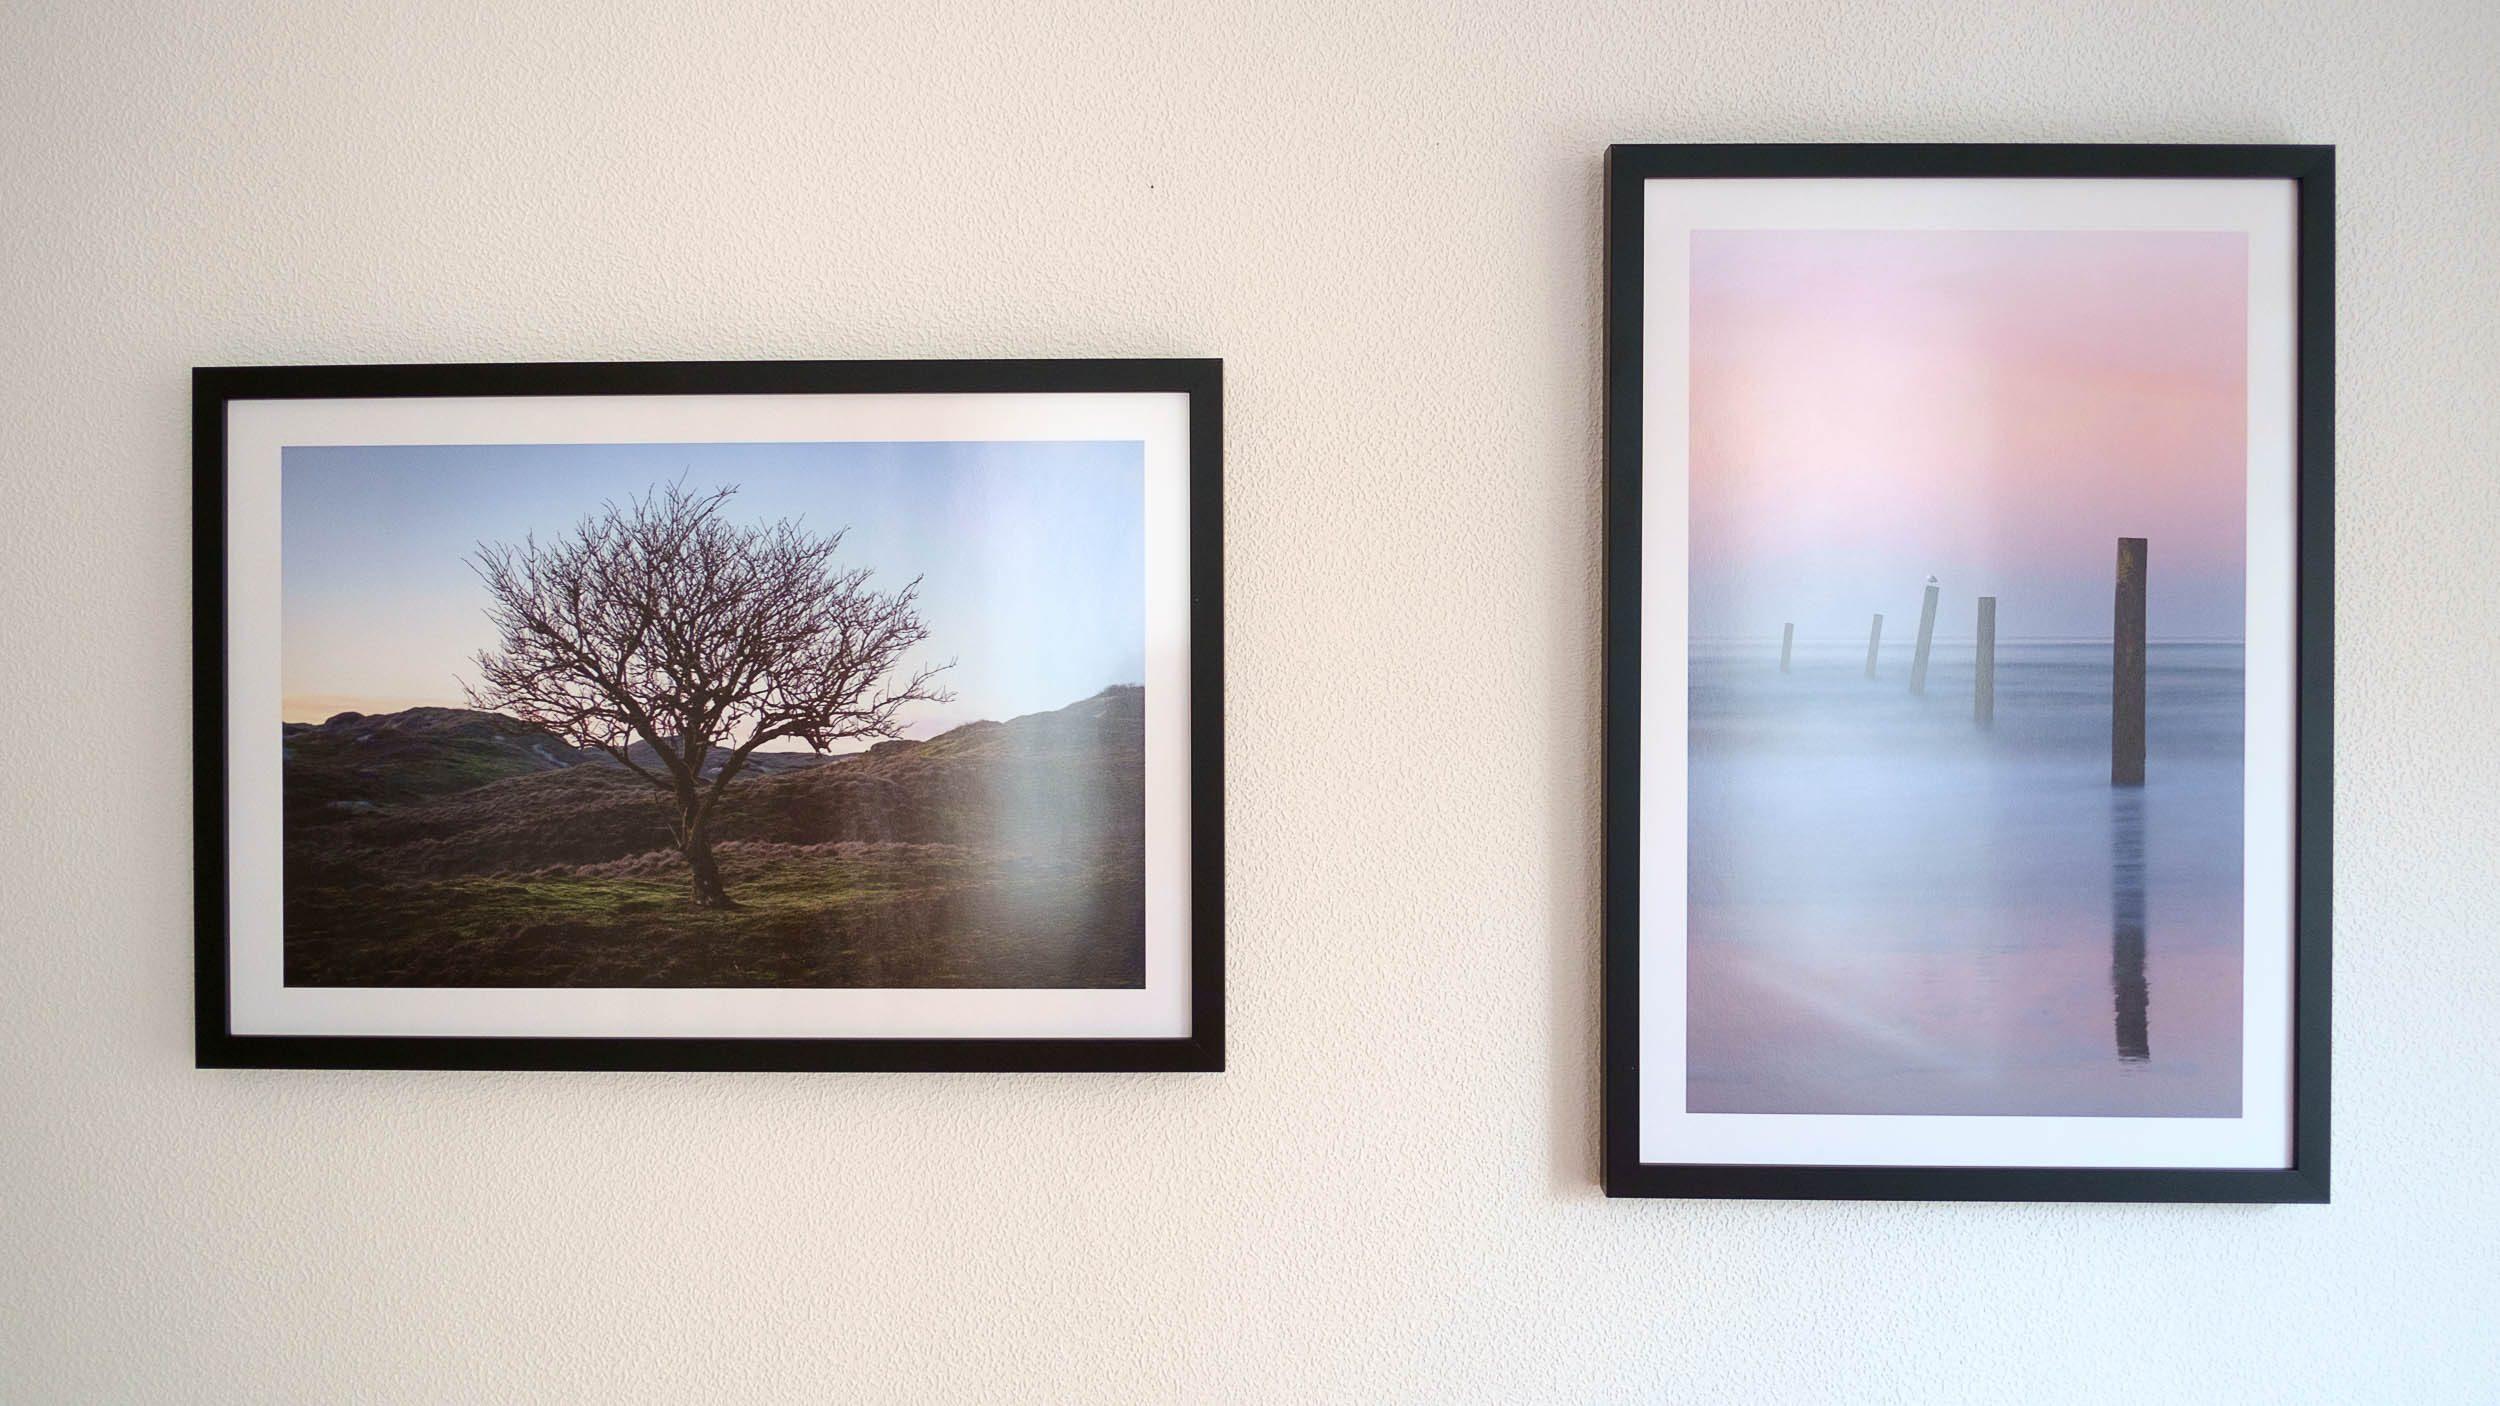 Fertige Bilder als Fine Art Prints